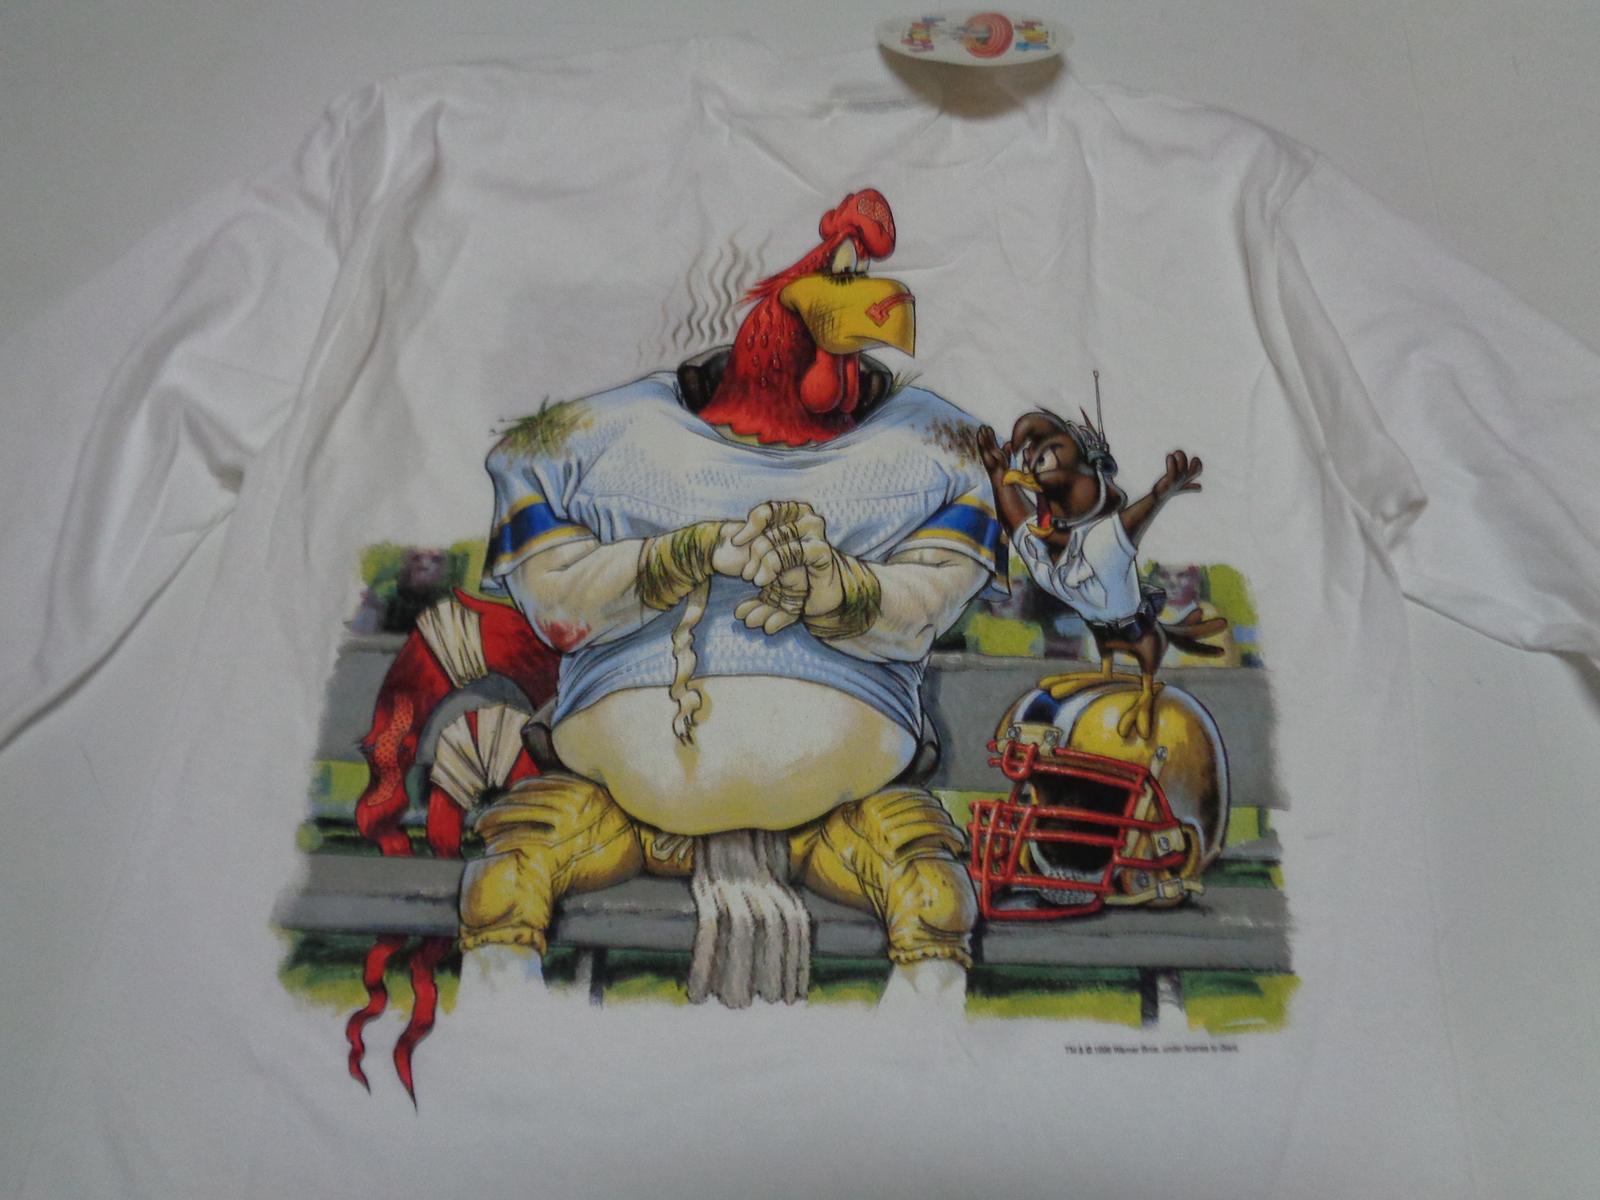 Looney Tunes Football League Gridiron Youth Shirt Foghorn Leghorn NWT Sz L